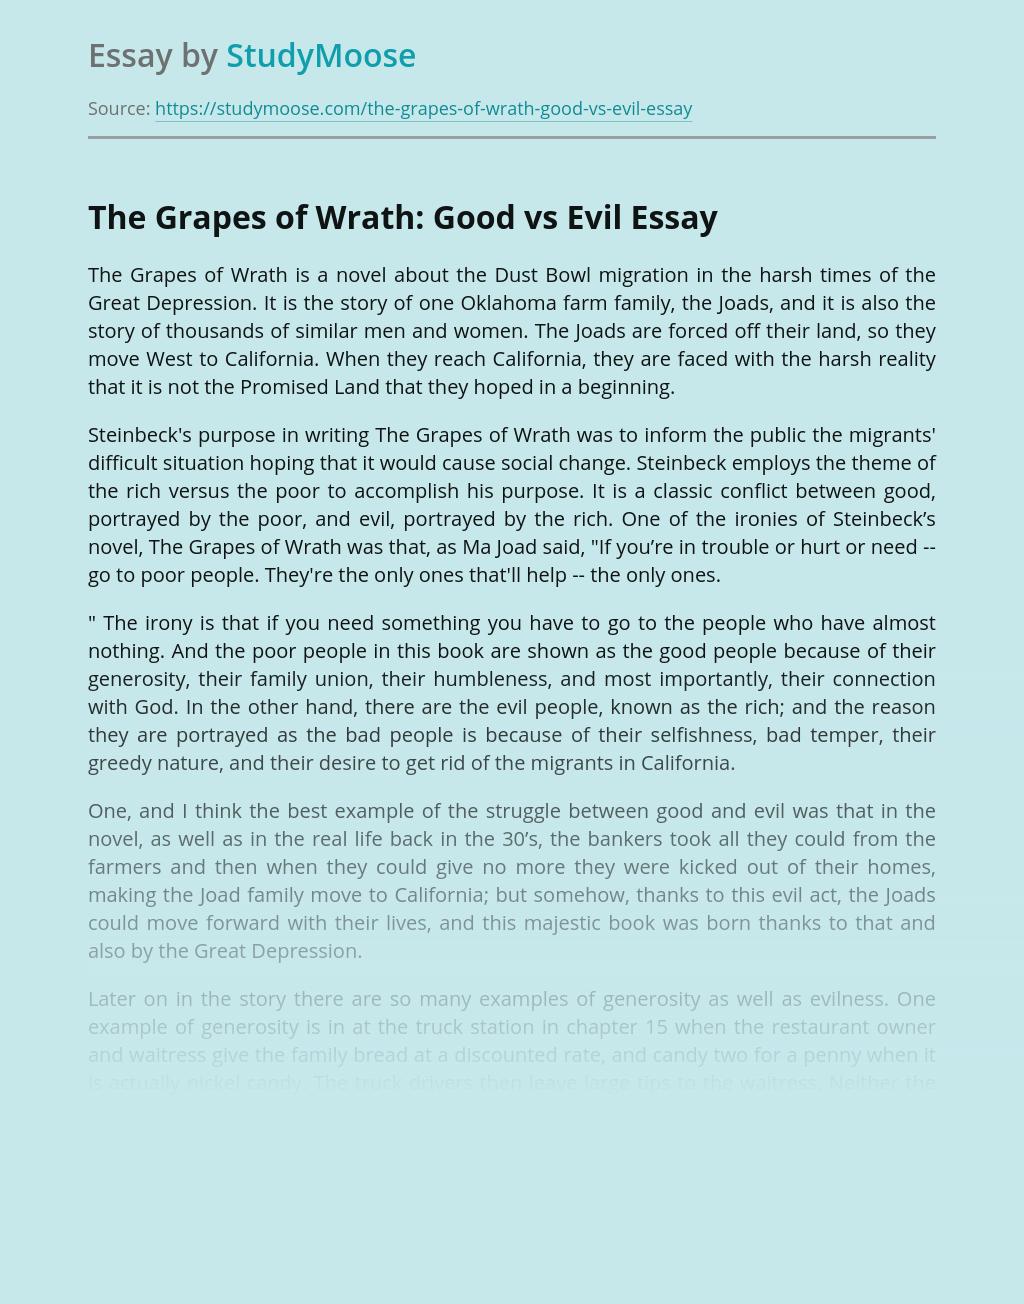 The Grapes of Wrath: Good vs Evil